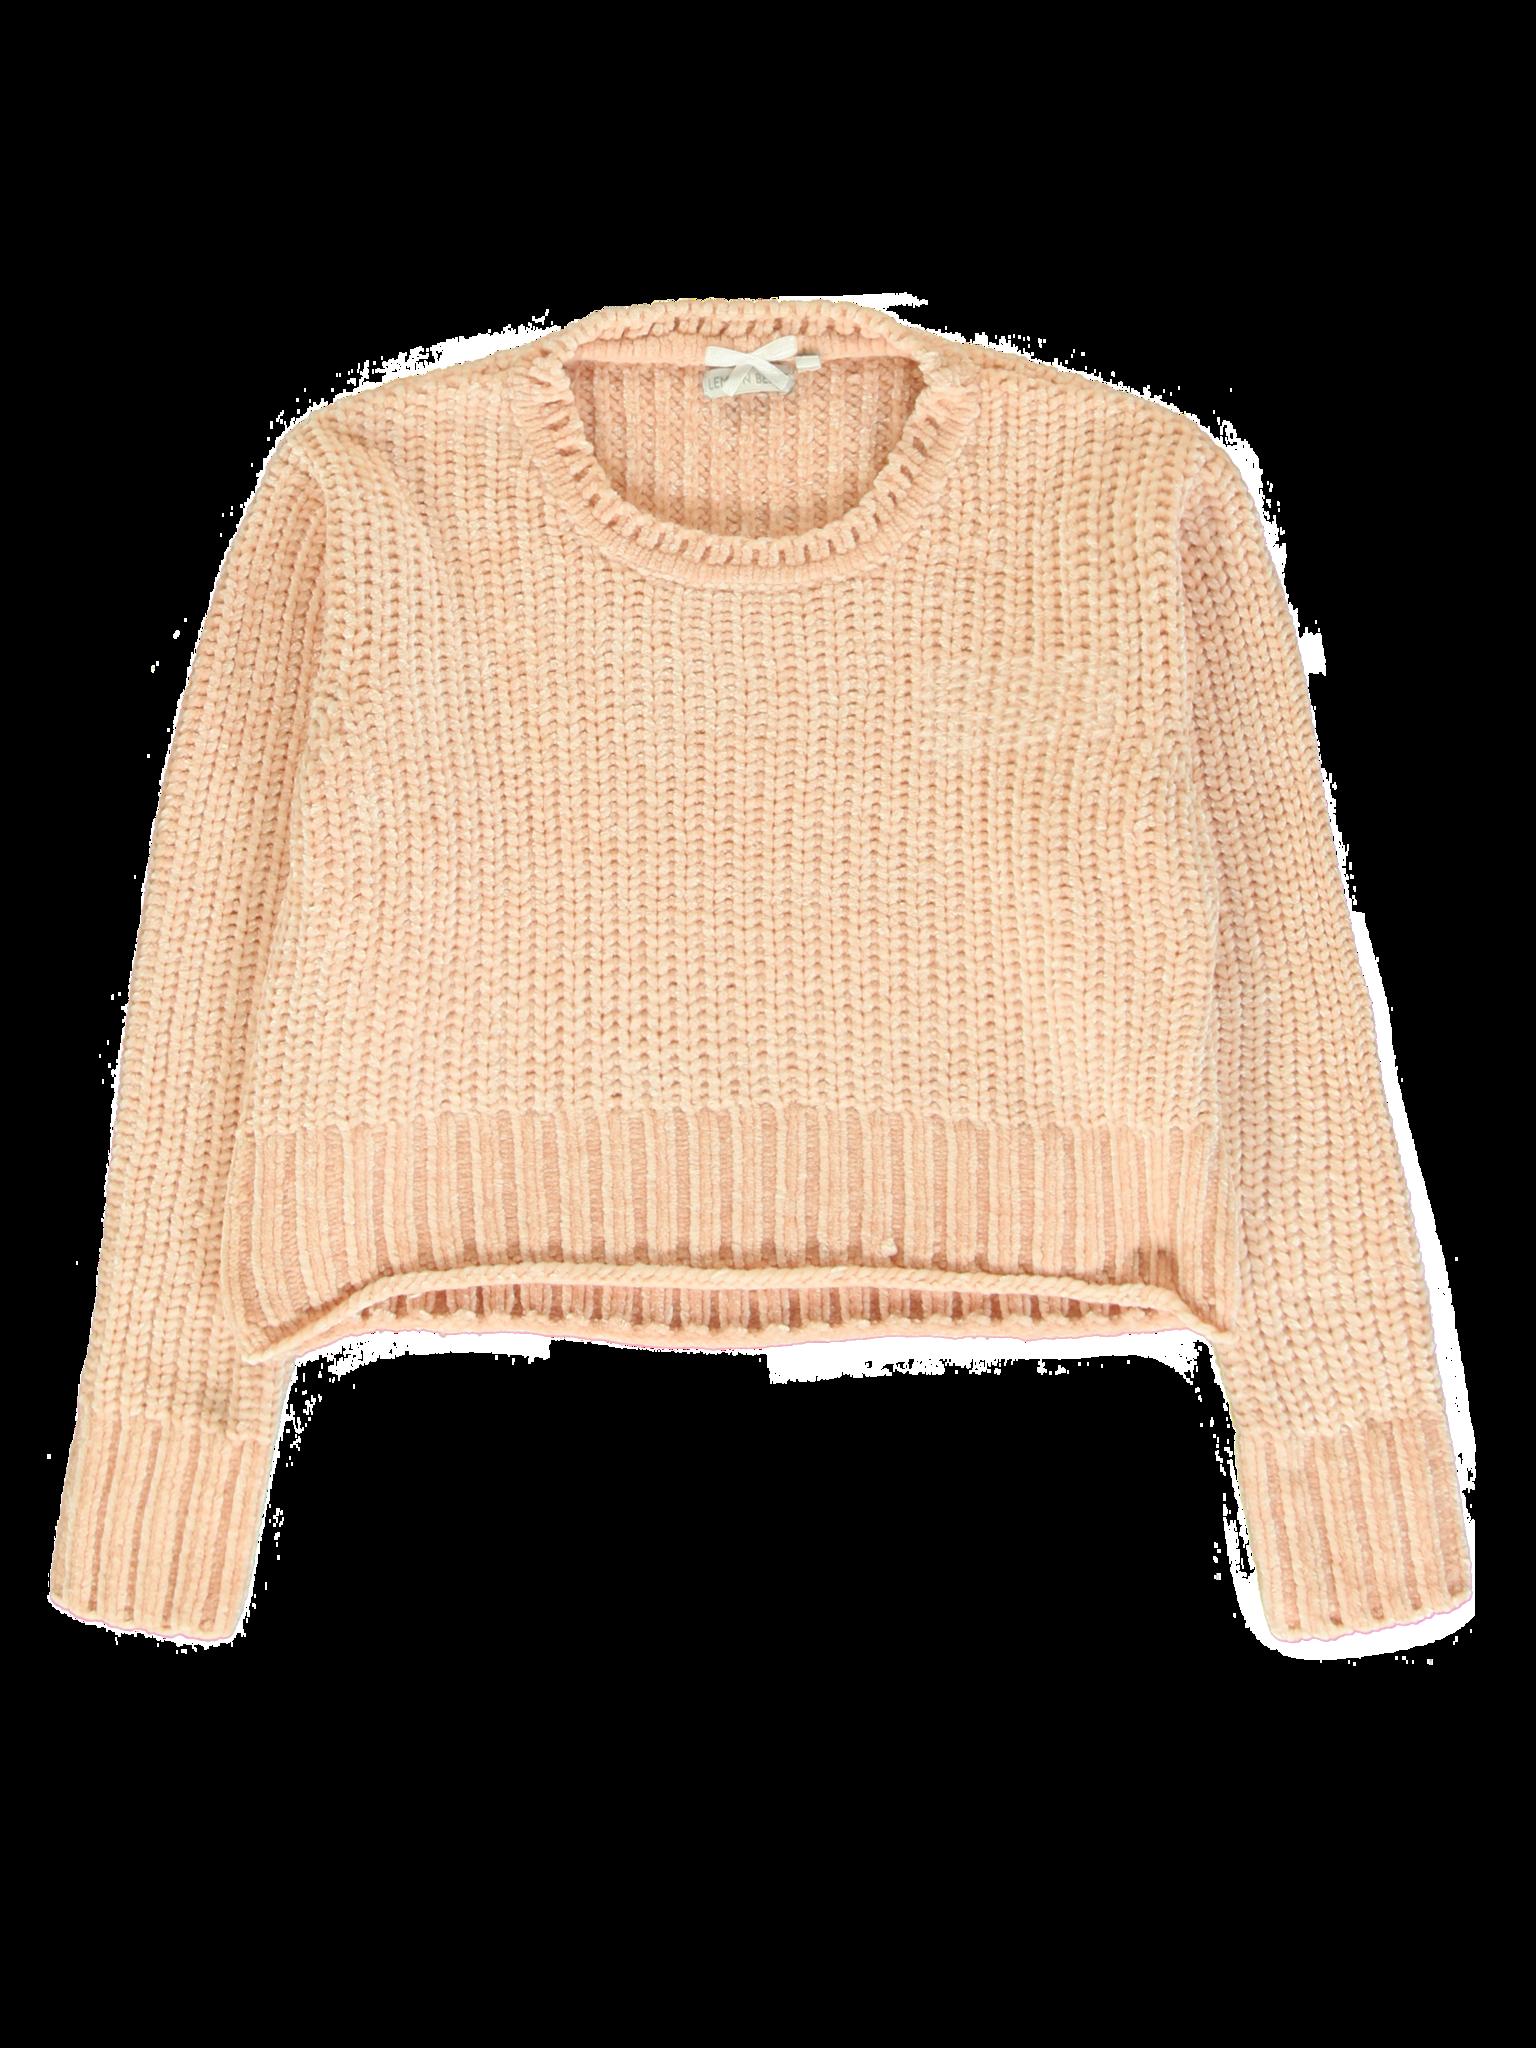 All Brands | Winterproducts Teen Girls | Pull | 12 pcs/box